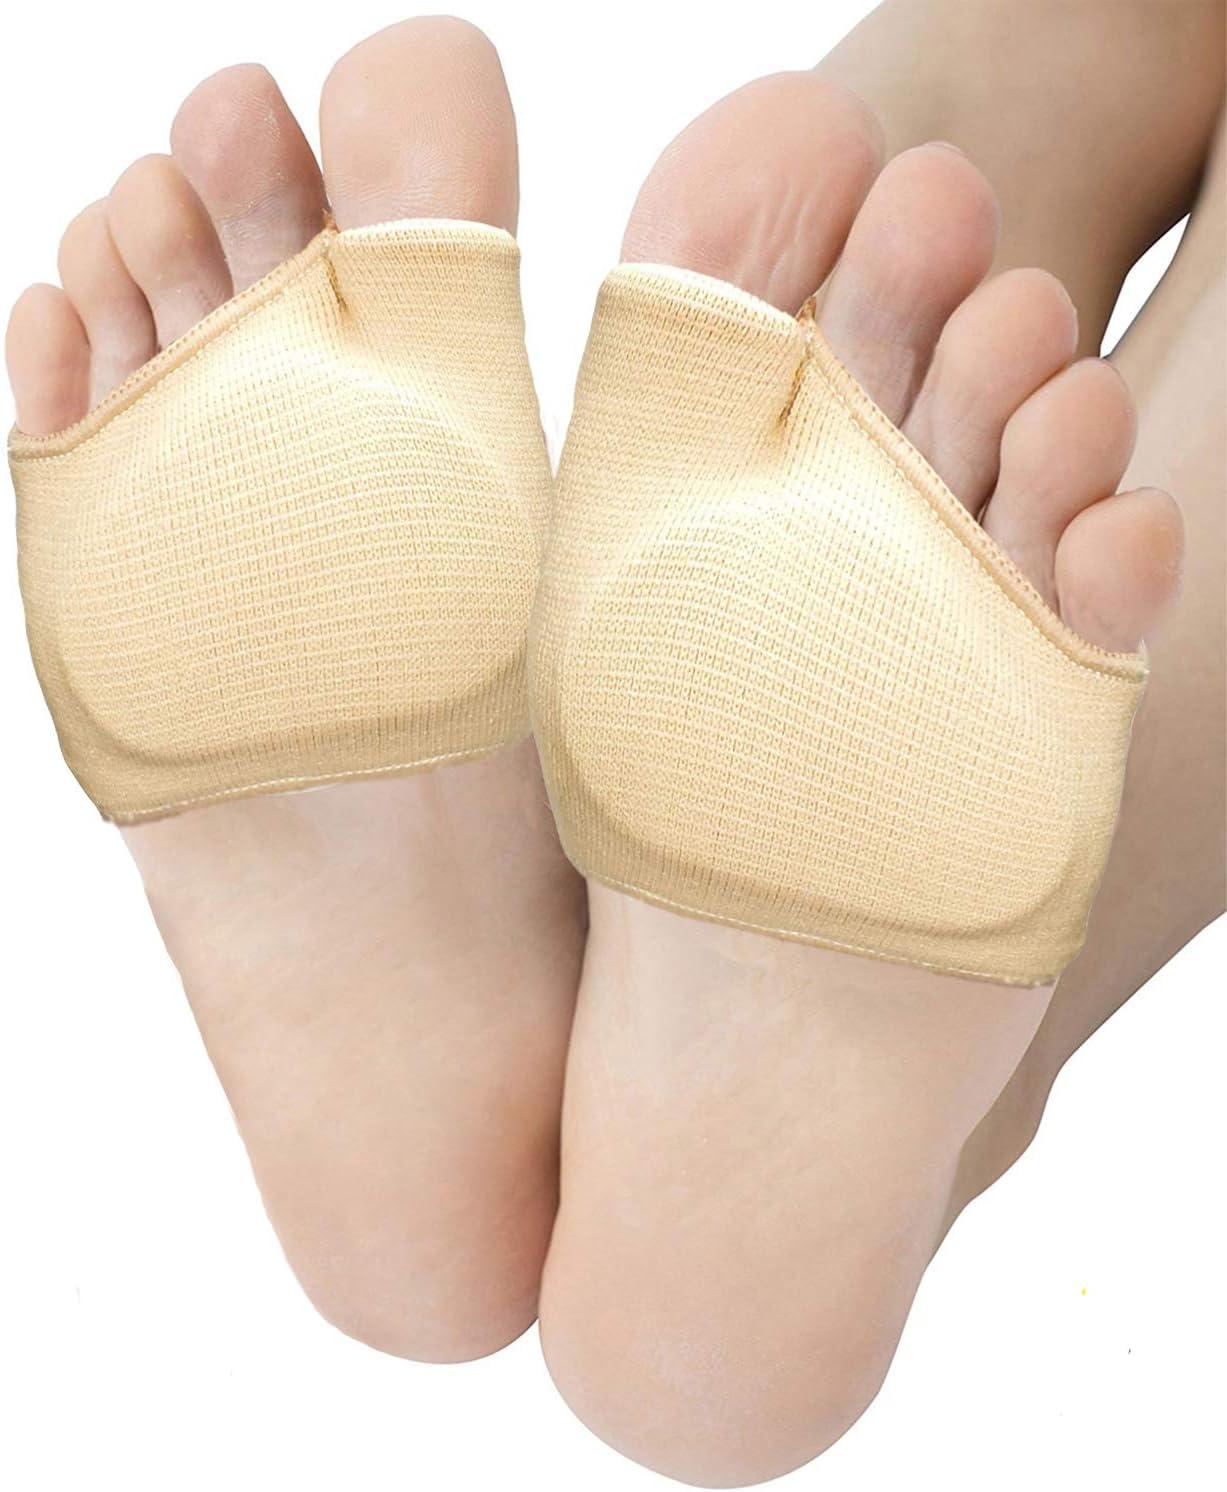 Metatarsal Sleeve Pads, Half Toe Bunion Sleeve with Sole Forefoot Gel Pads Cushion